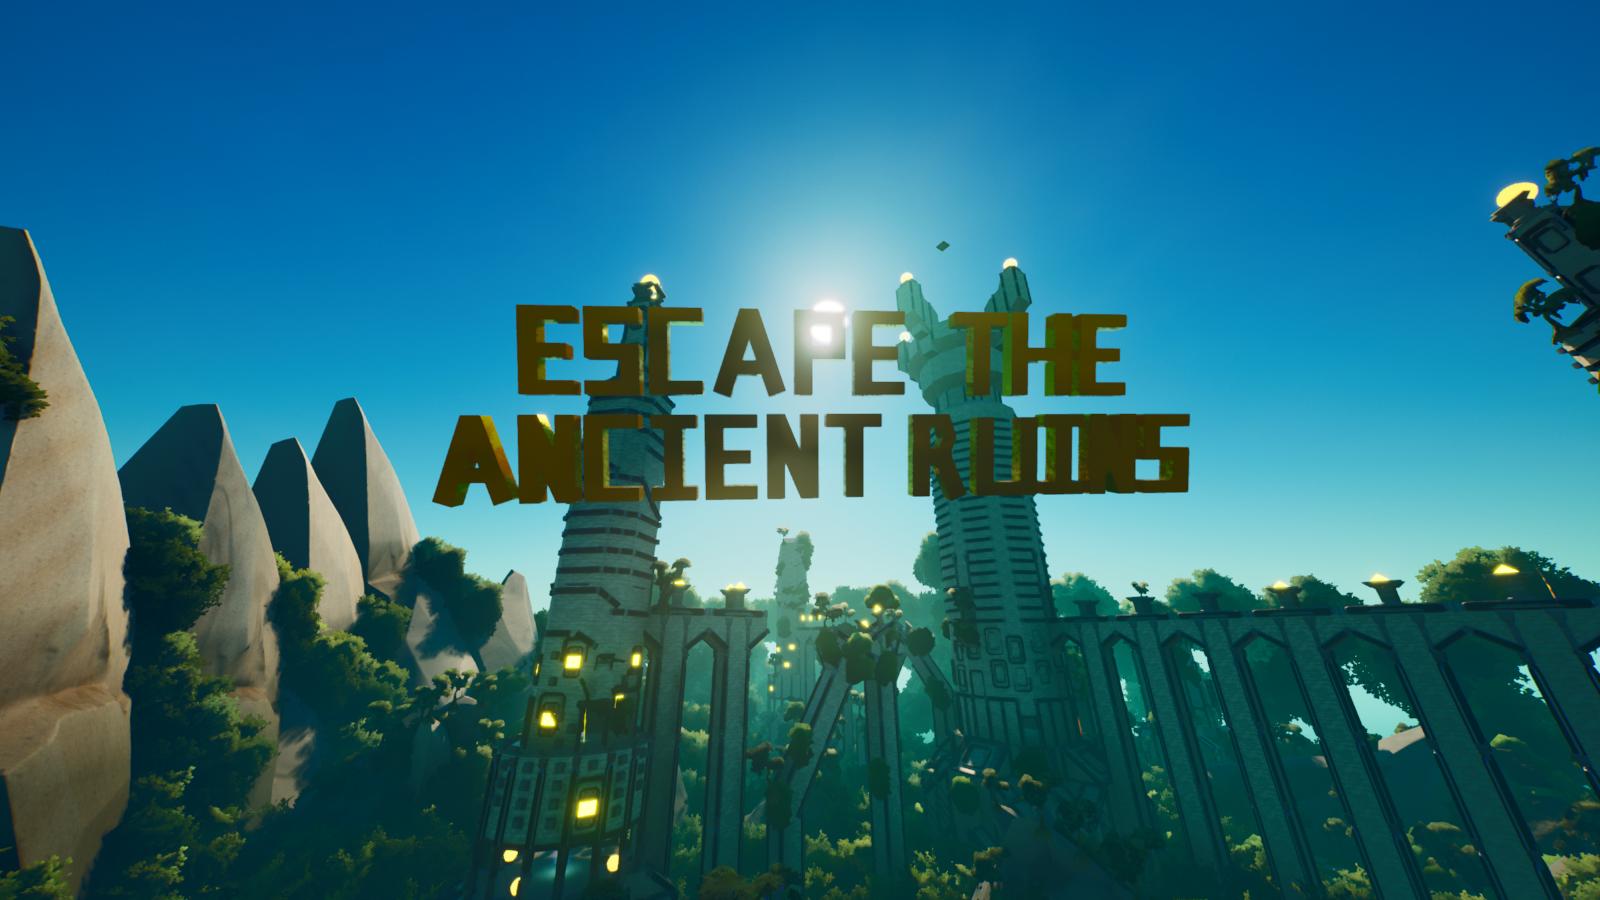 Escape The Ancient Ruins 2105-4880-7093 by dimensionaldrake